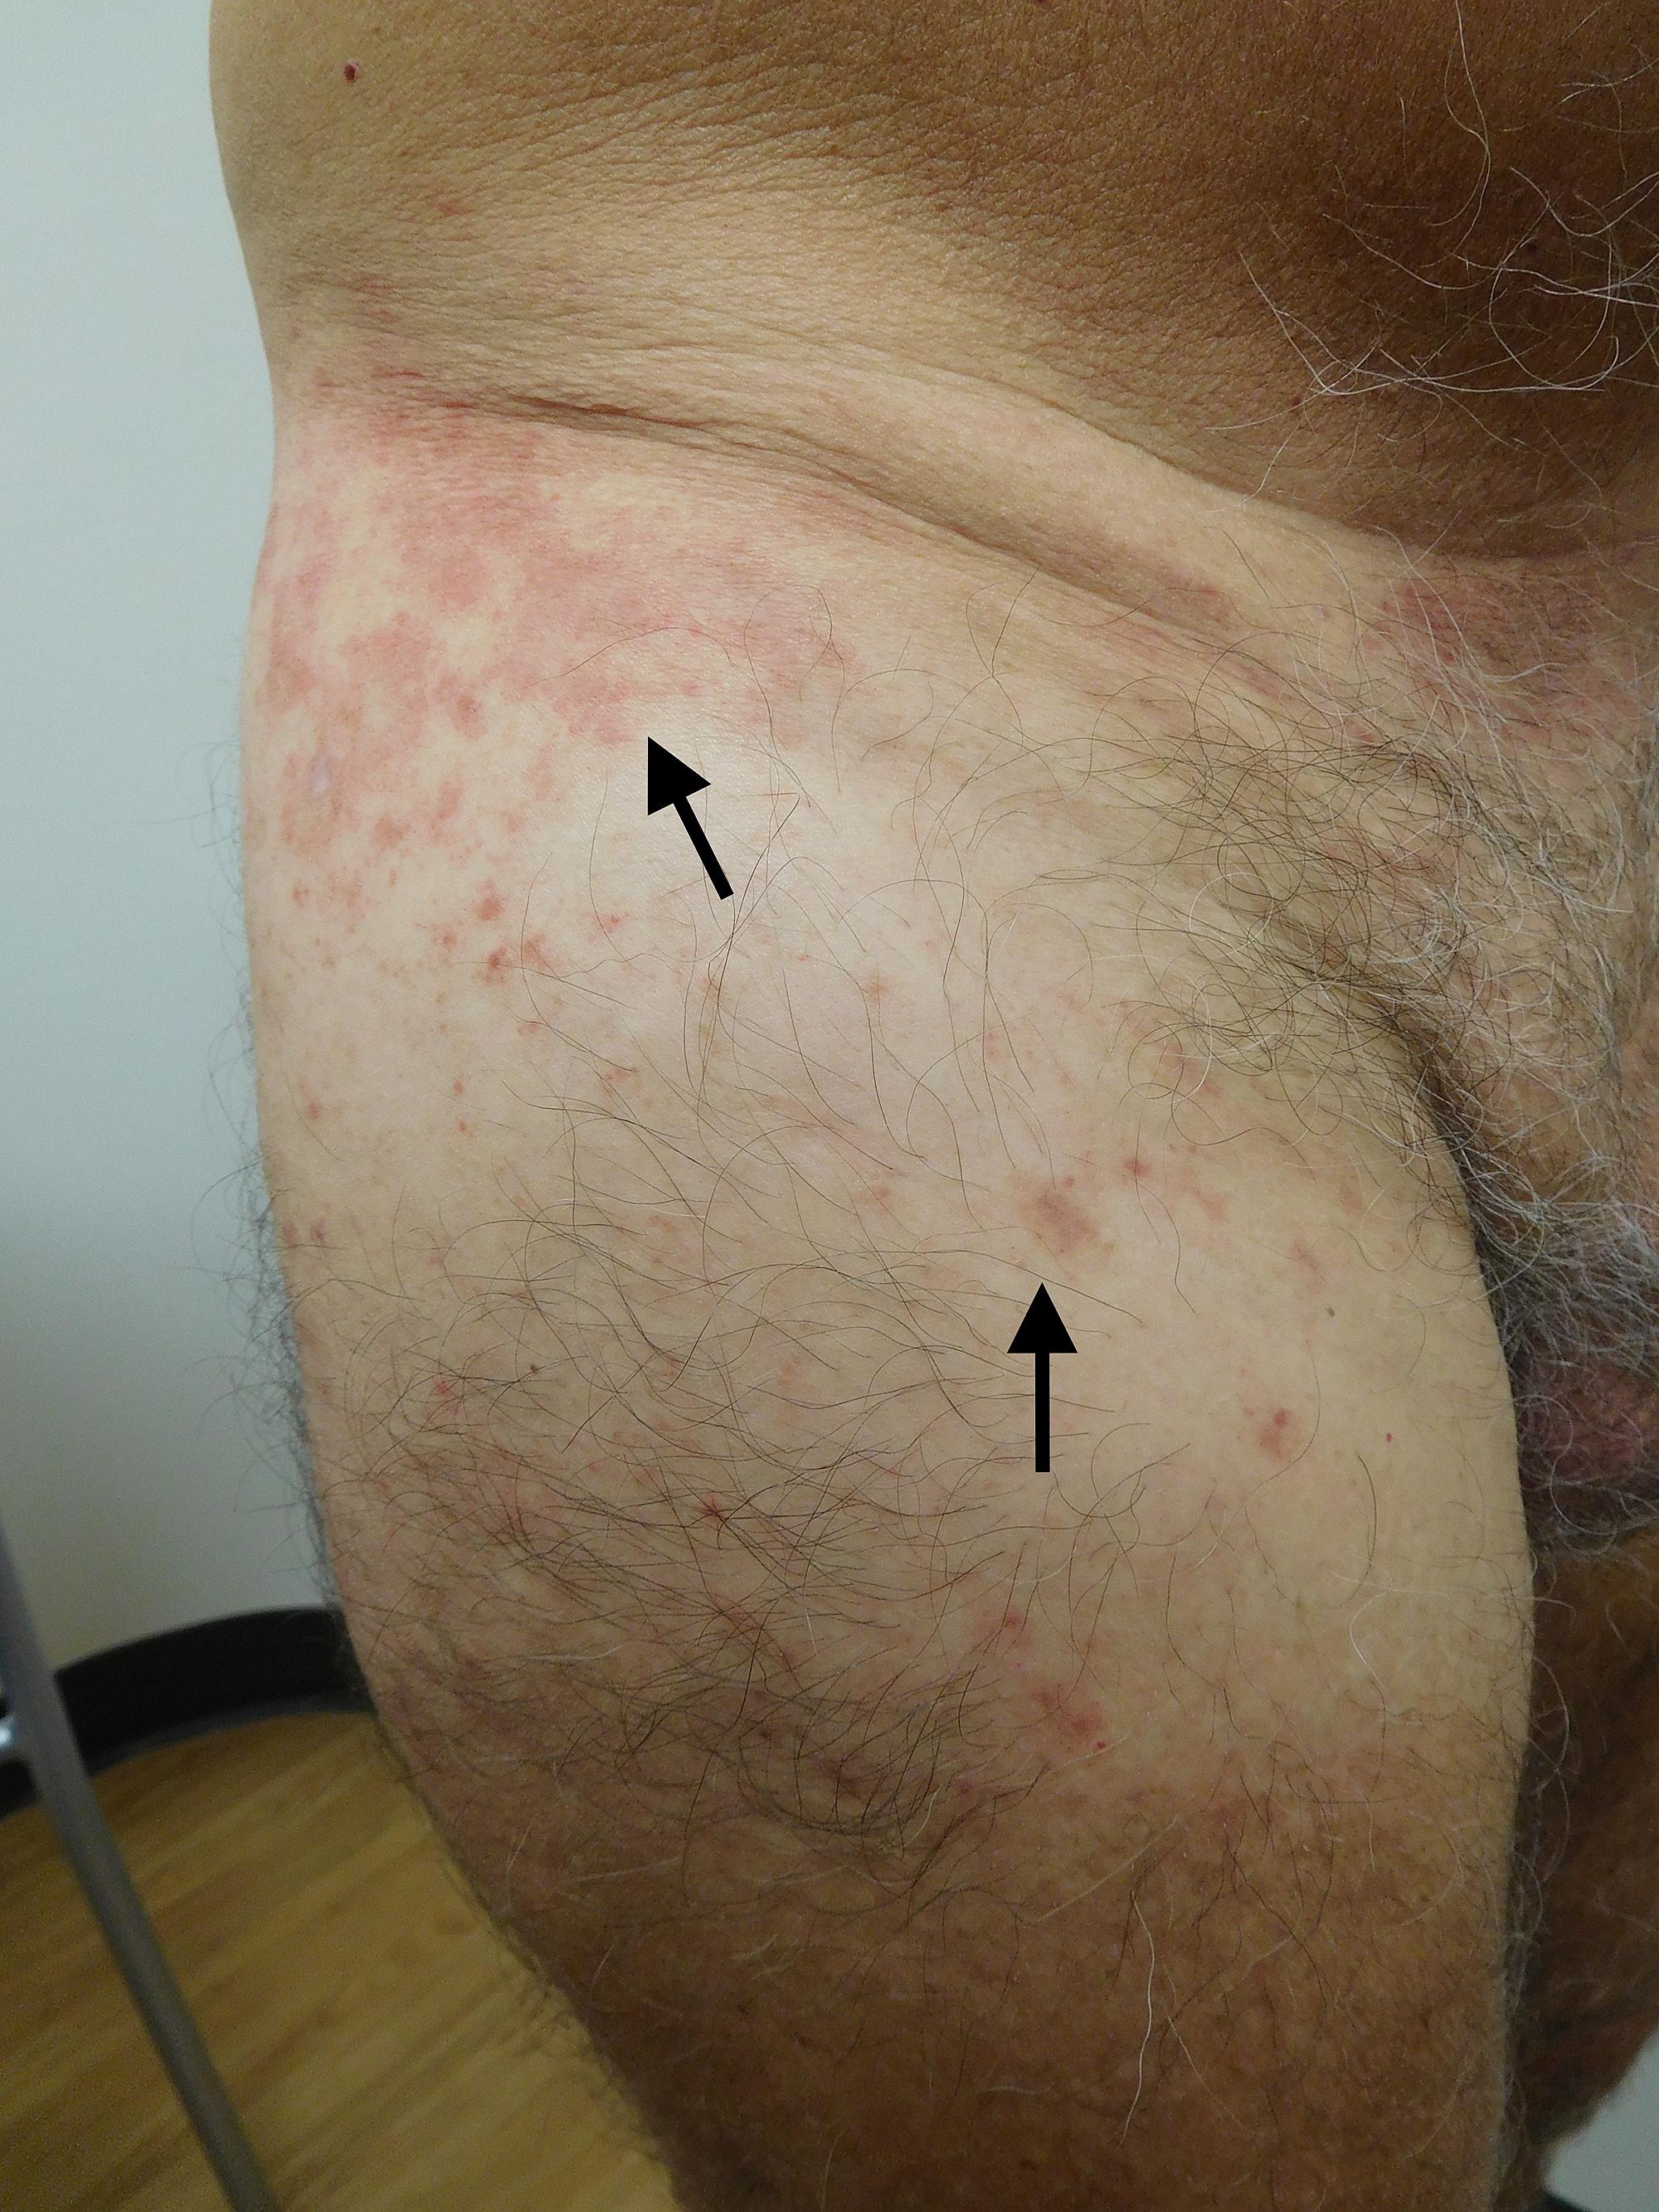 Cureus | Testosterone Pellet Associated Dermatitis: Report